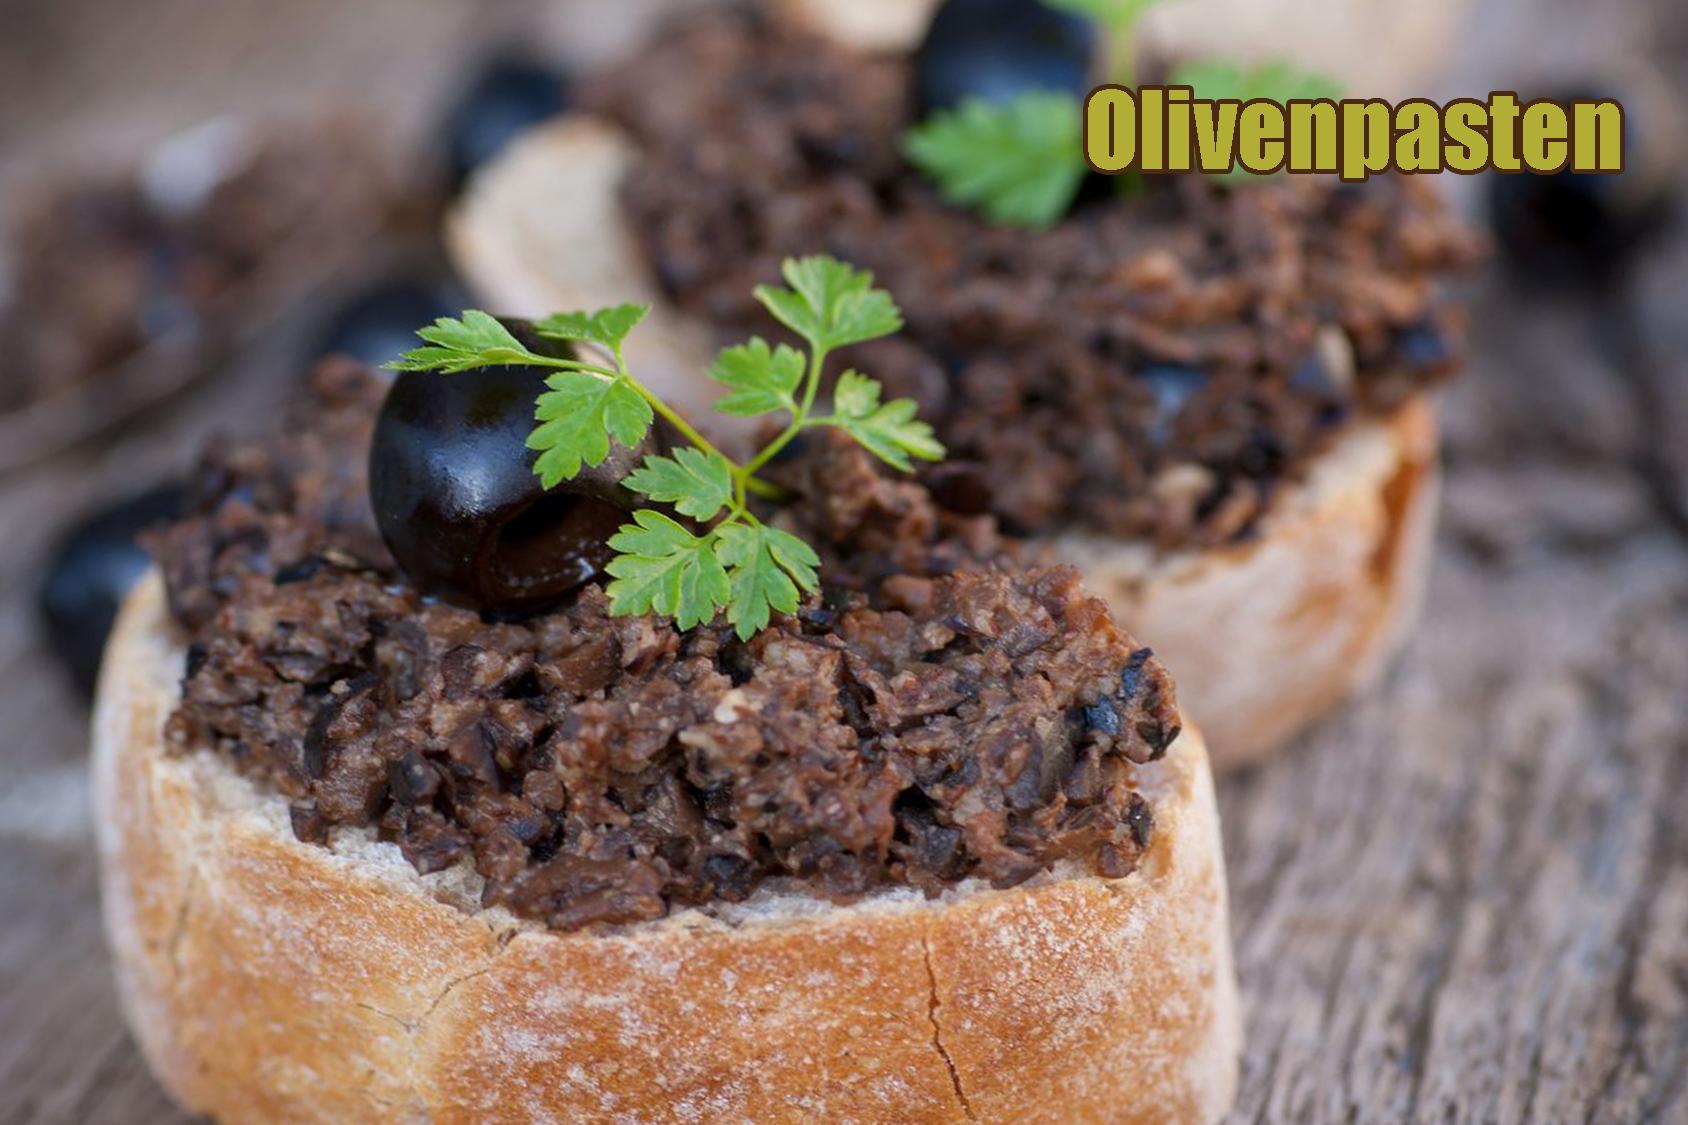 Griechisches-olivenoel.com